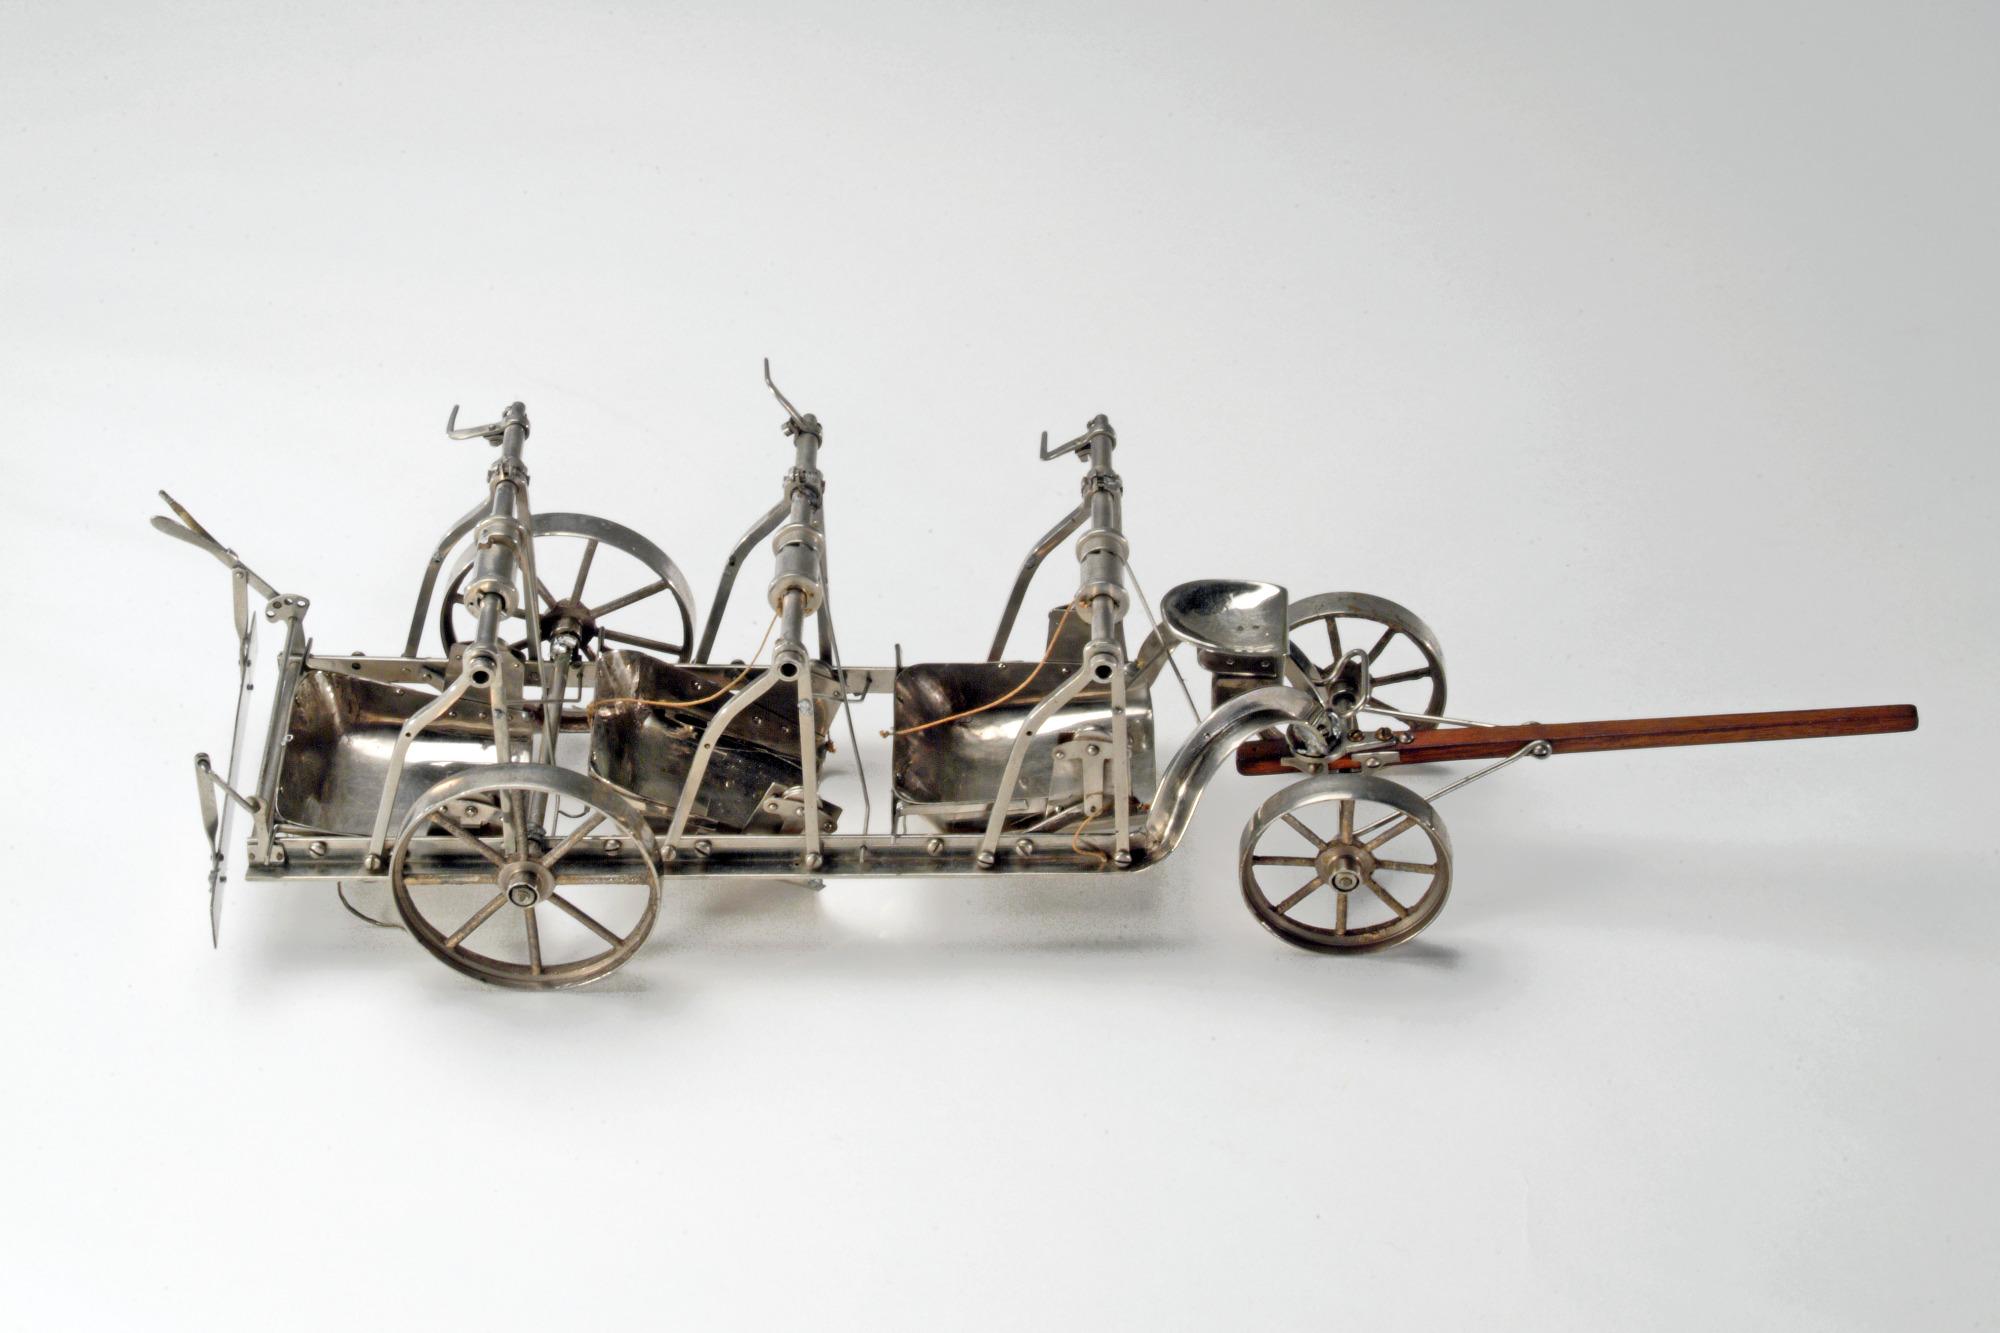 Patent model, road scraper, 1894